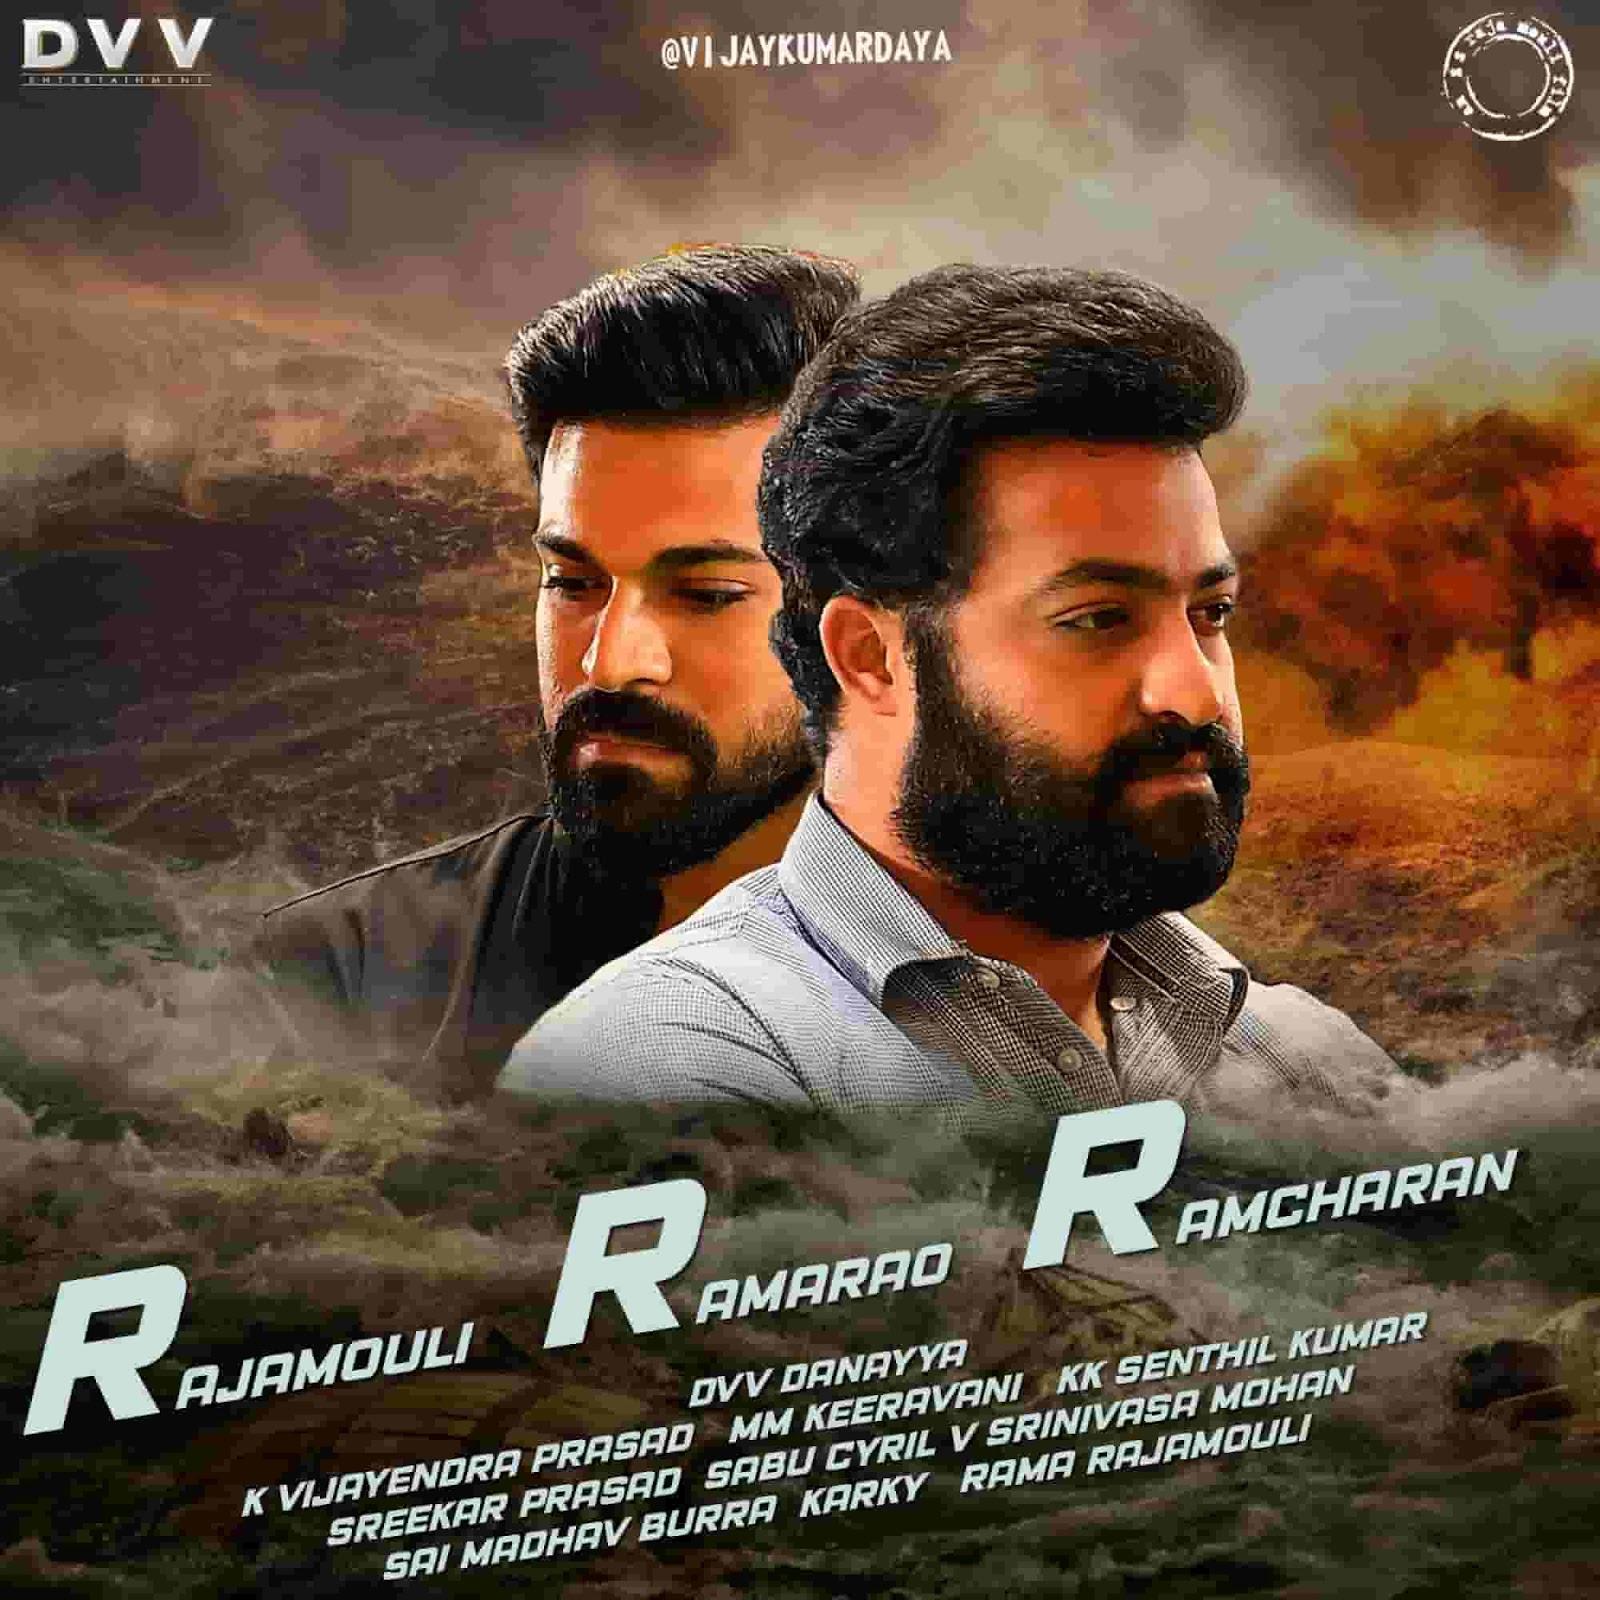 RRR Movie Songs Lyrics | Rajamouli Ram Charan | Ramarao | Keeravani Songs